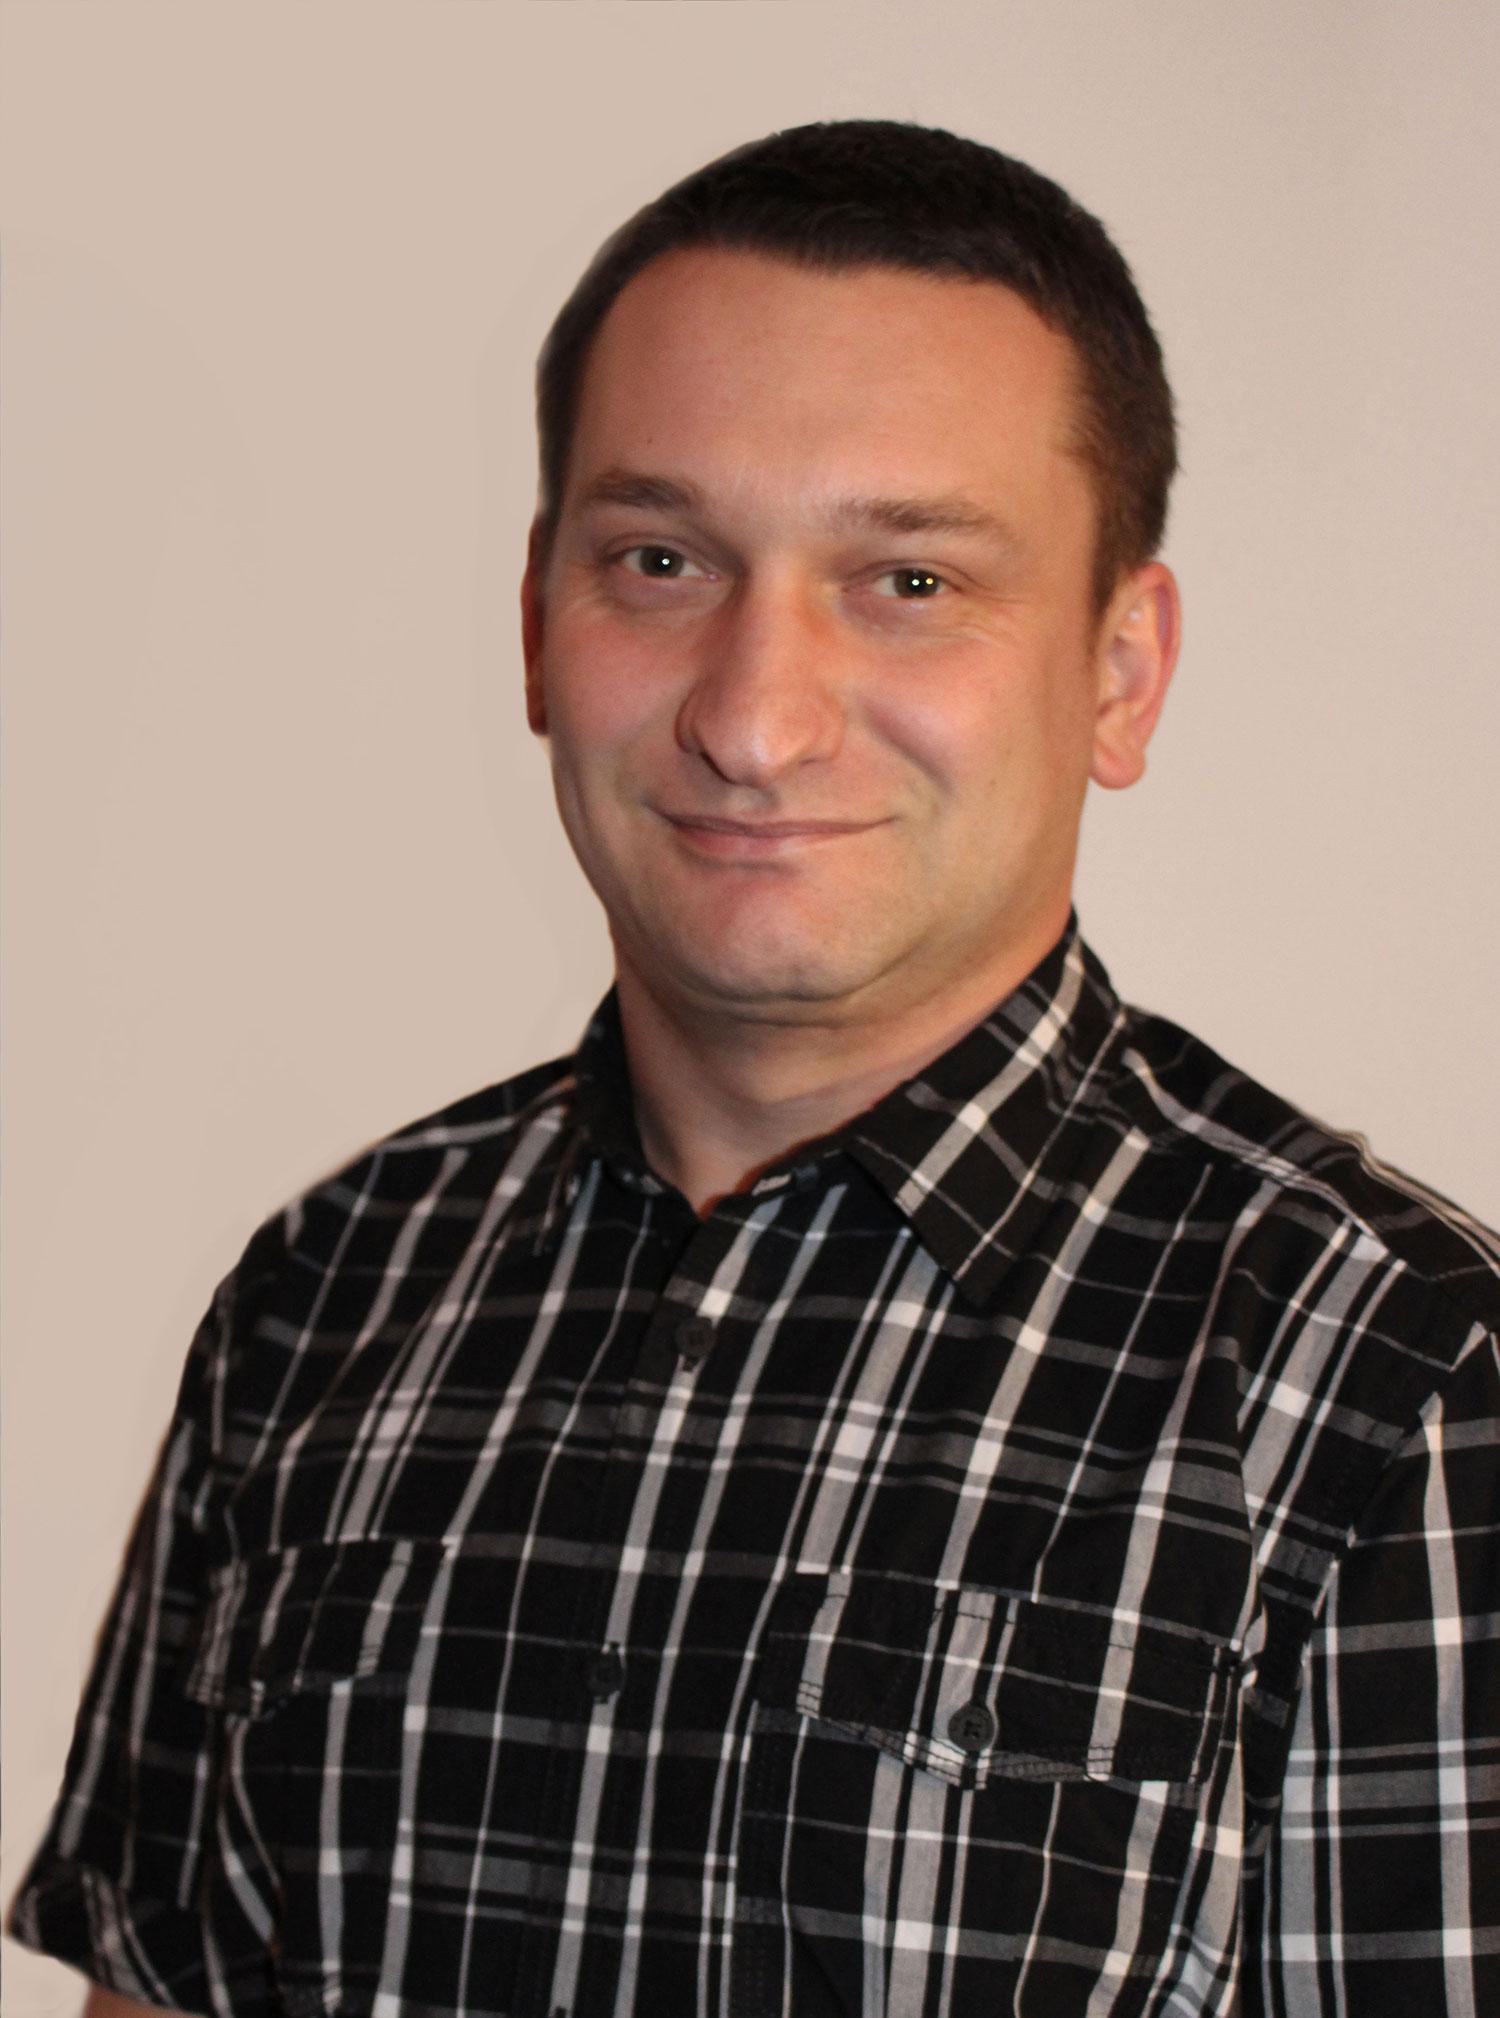 Instruktor OSK Jantar Janusz